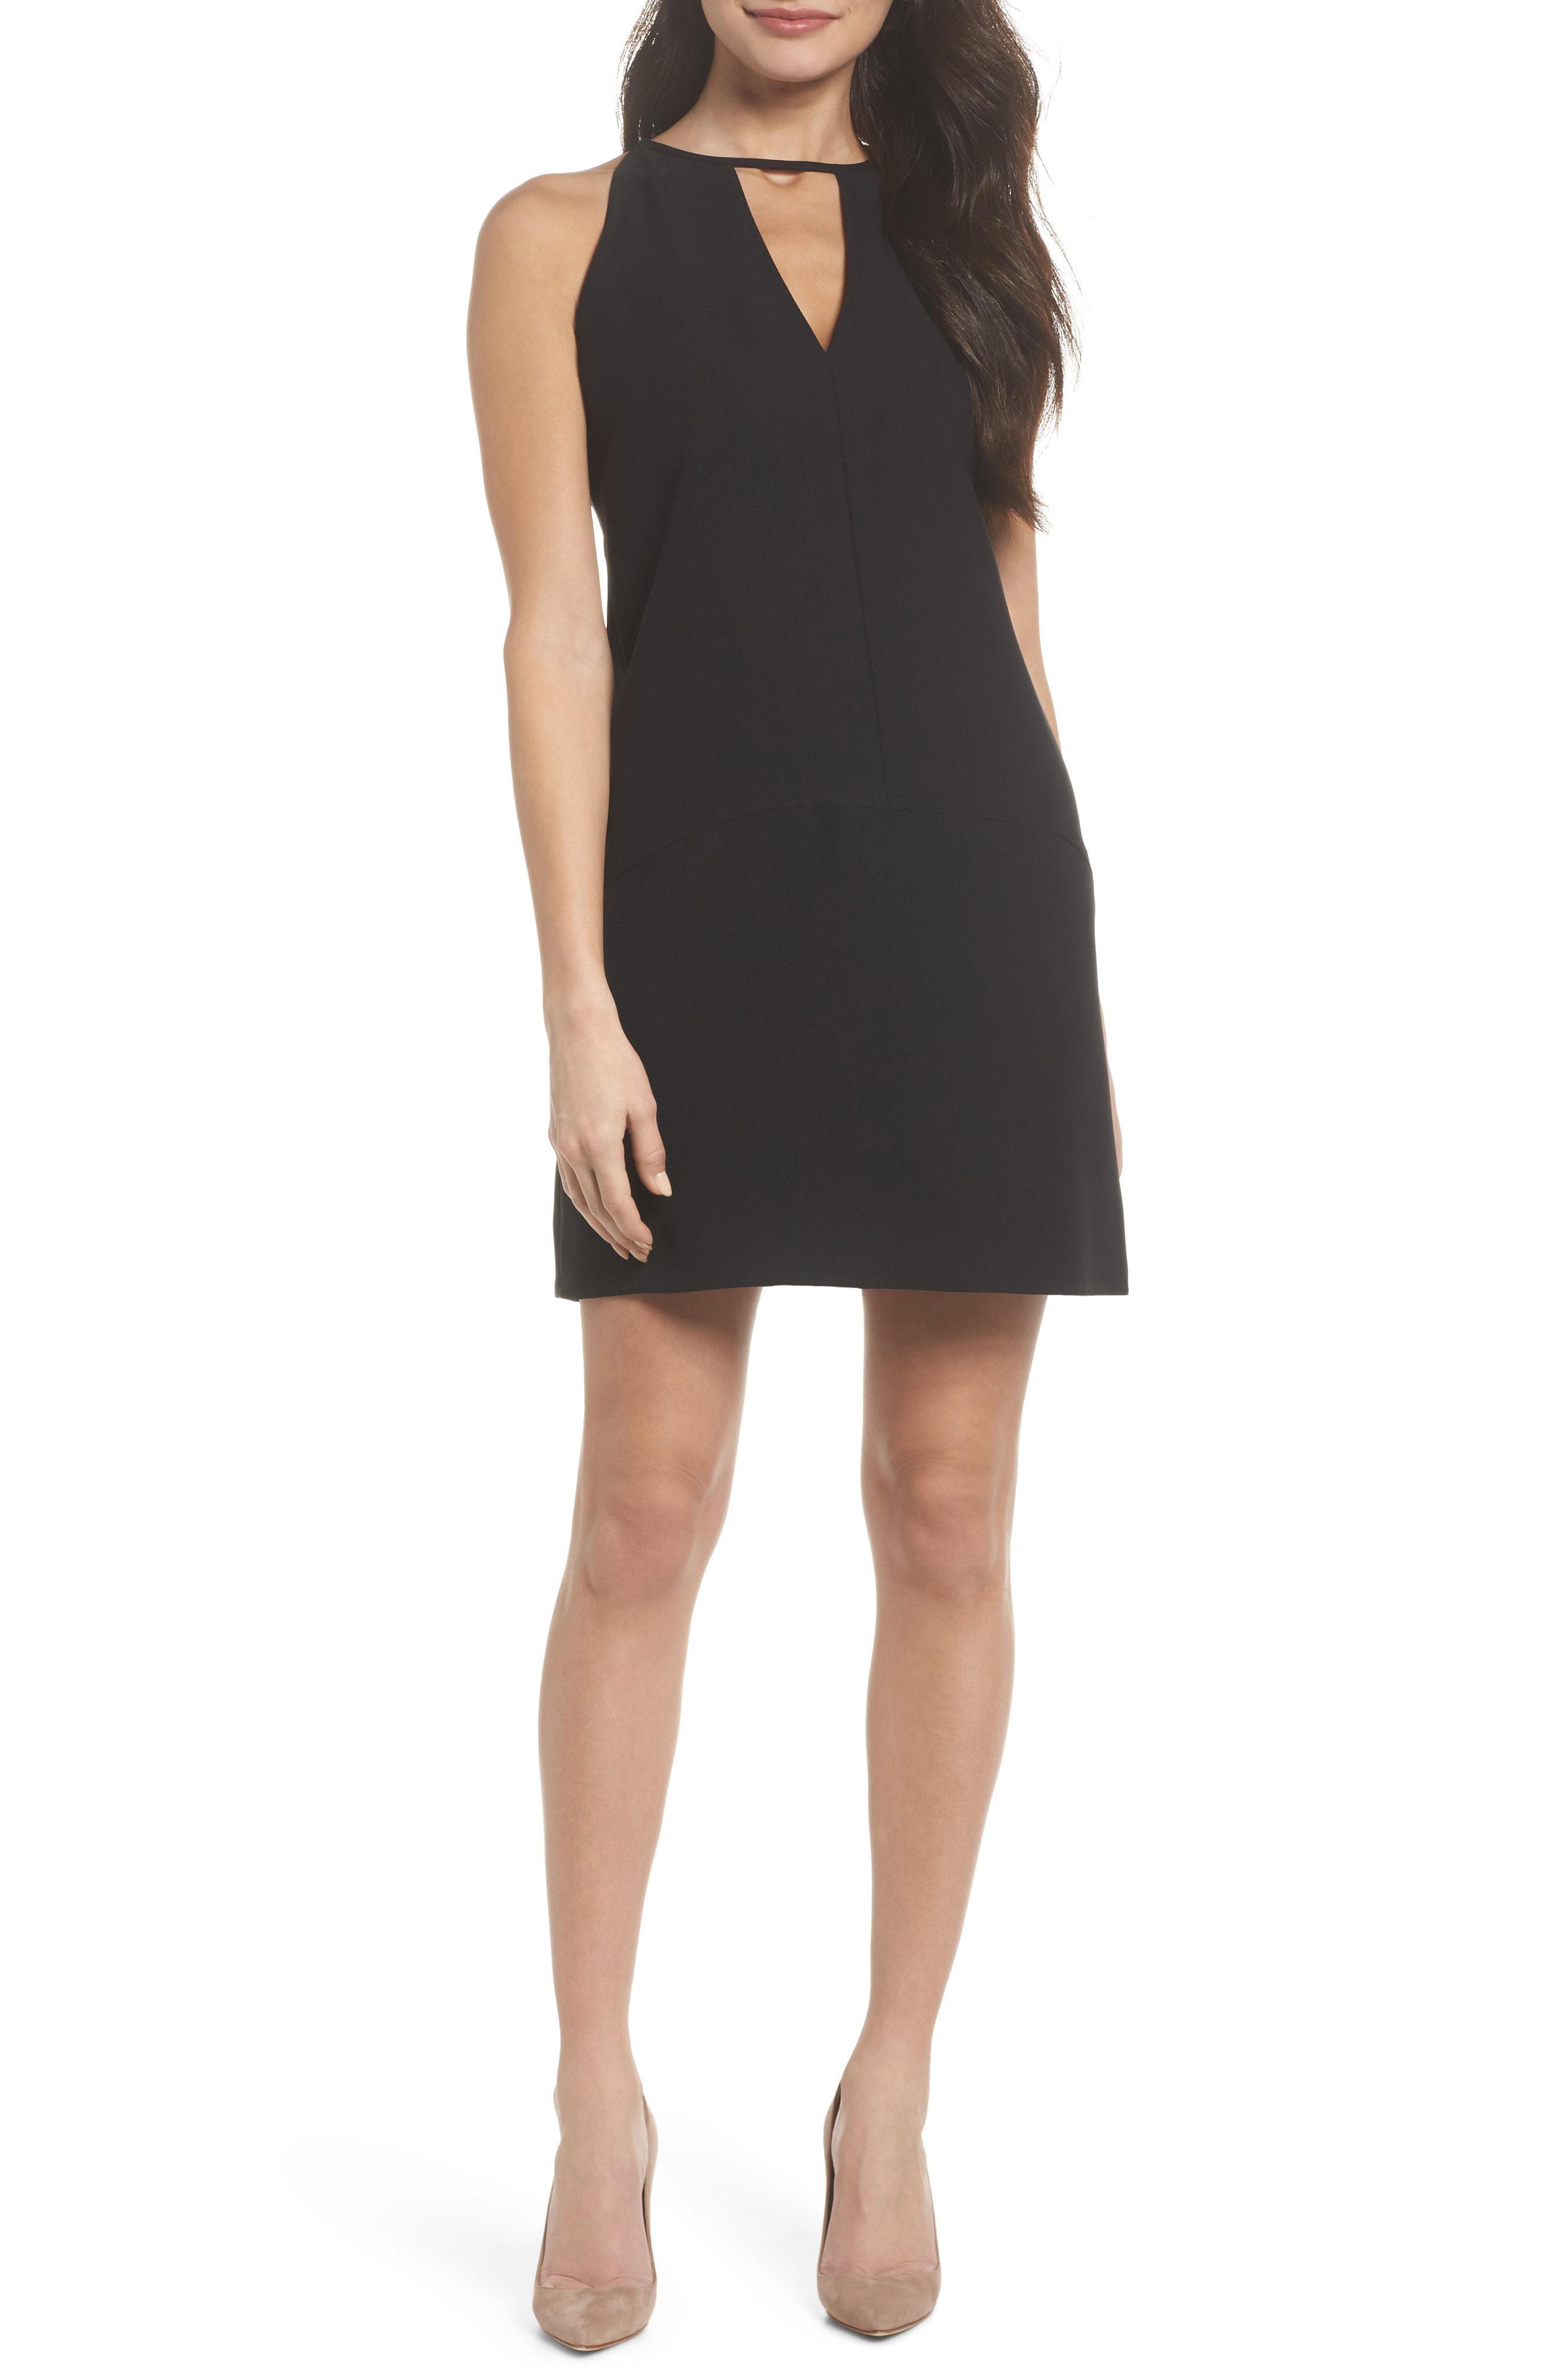 da1c8303 Lyst - Sam Edelman Keyhole Shift Dress in Black - Save 41%